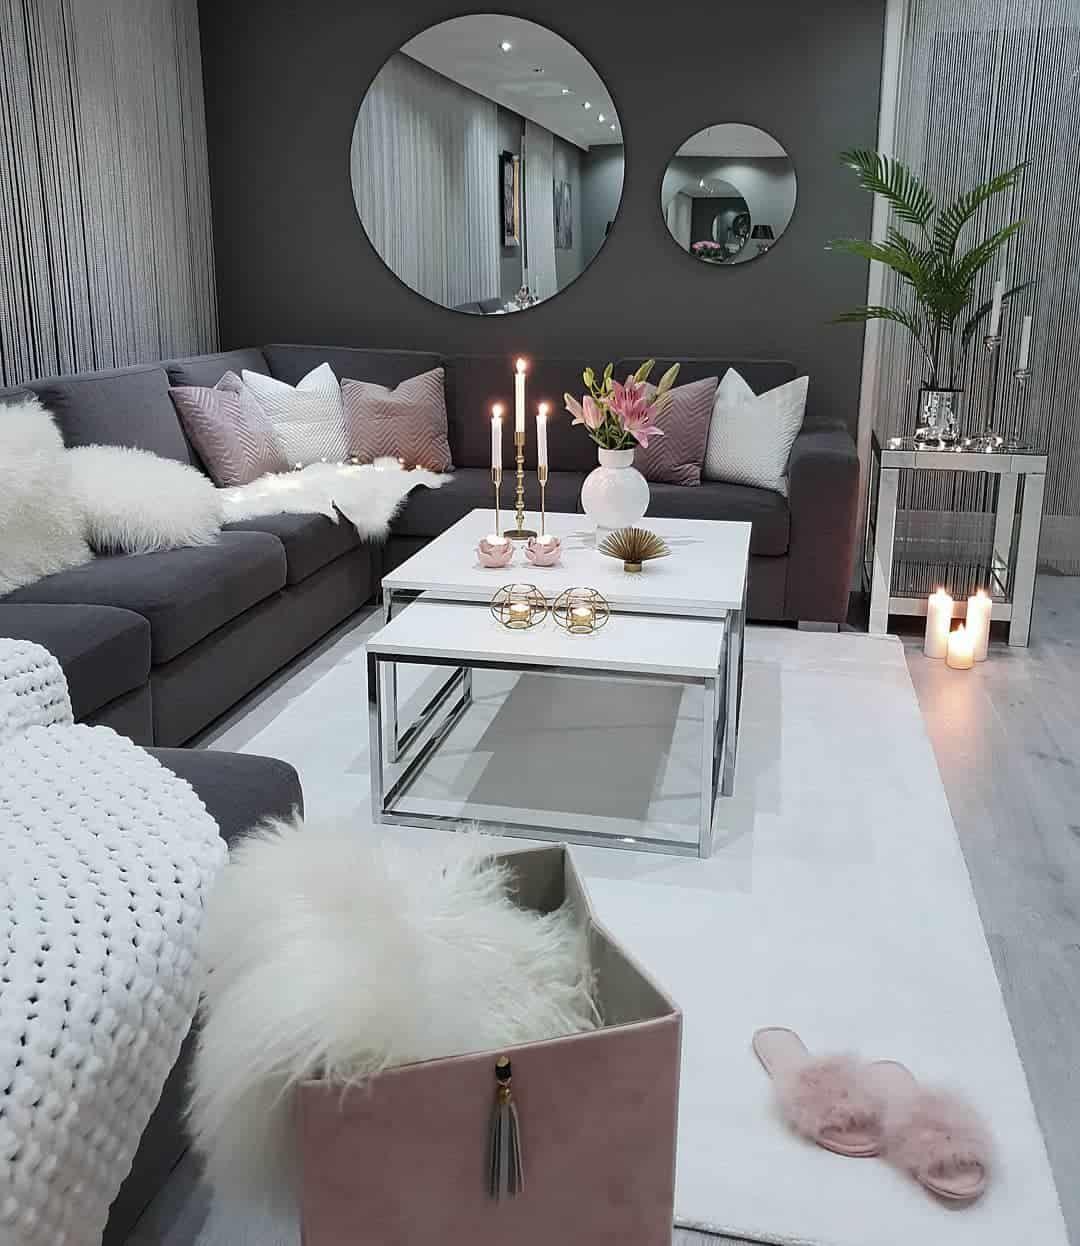 28 Cozy Living Room Decor Ideas To Copy Society19 Living Room Grey Cozy Living Rooms Living Room Decor Cozy